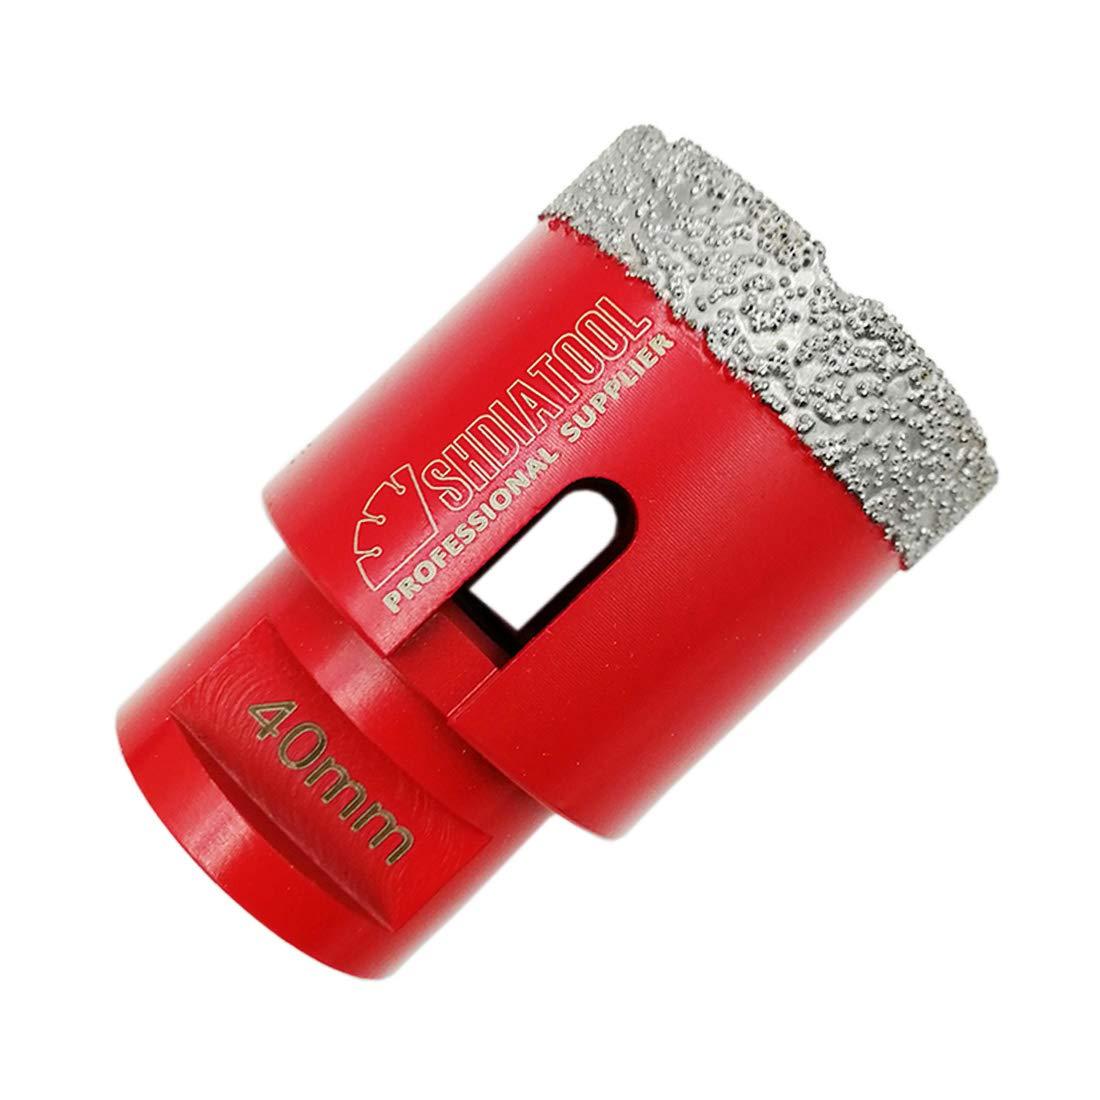 SHDIATOOL Dry Diamond Drill Core Bit Diameter 20mm Vacuum Brazed Drilling Porcelain Tile Granite Marble